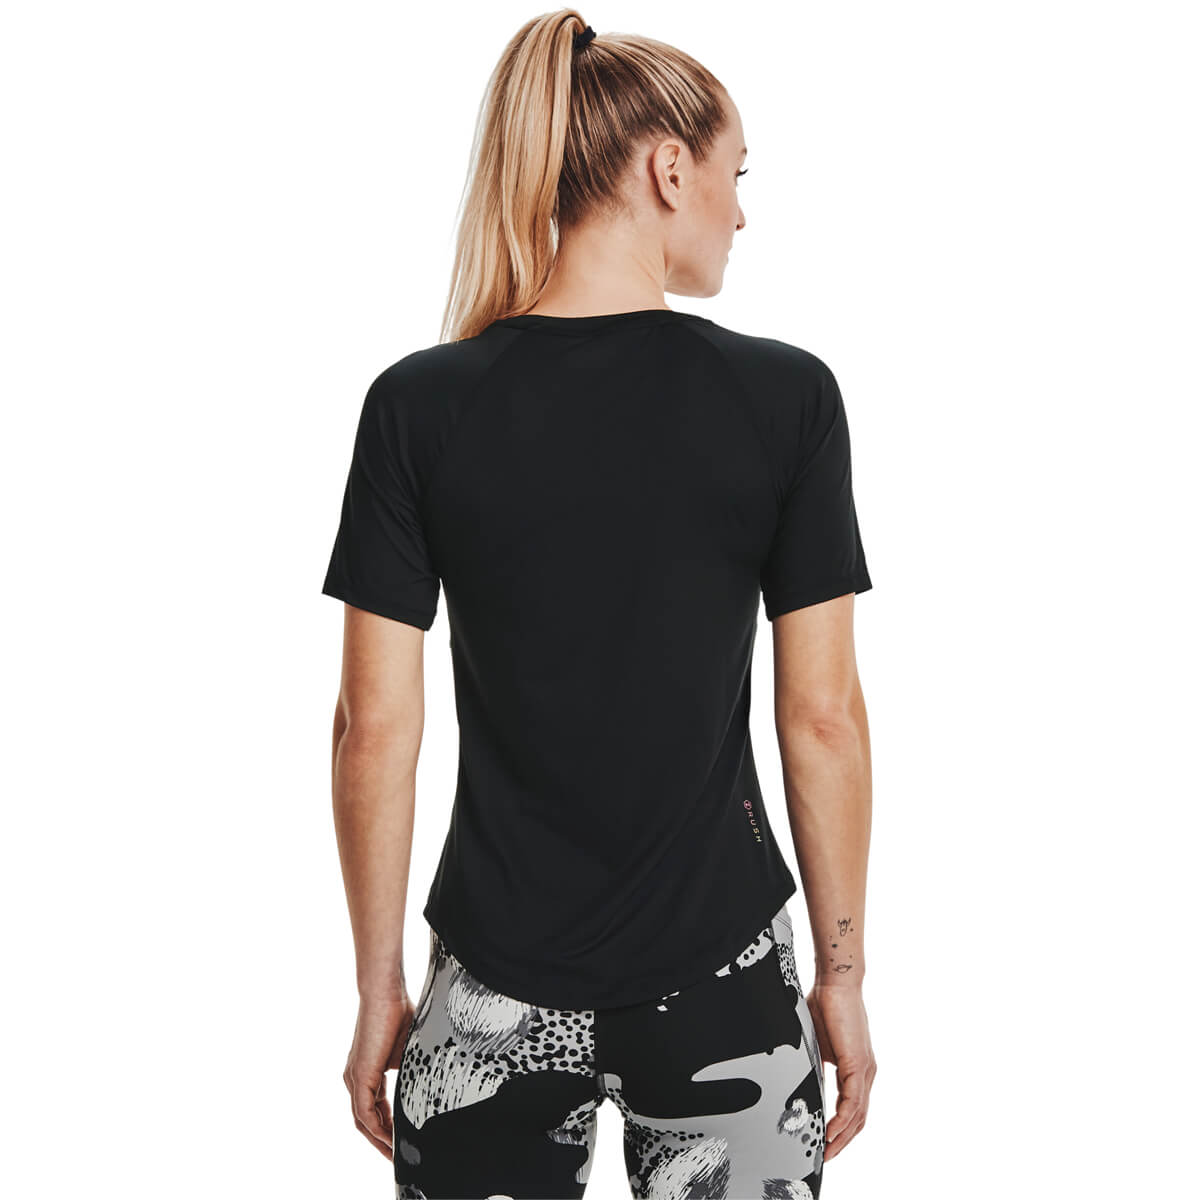 Under Armour Rush Trænings T-shirt Dame